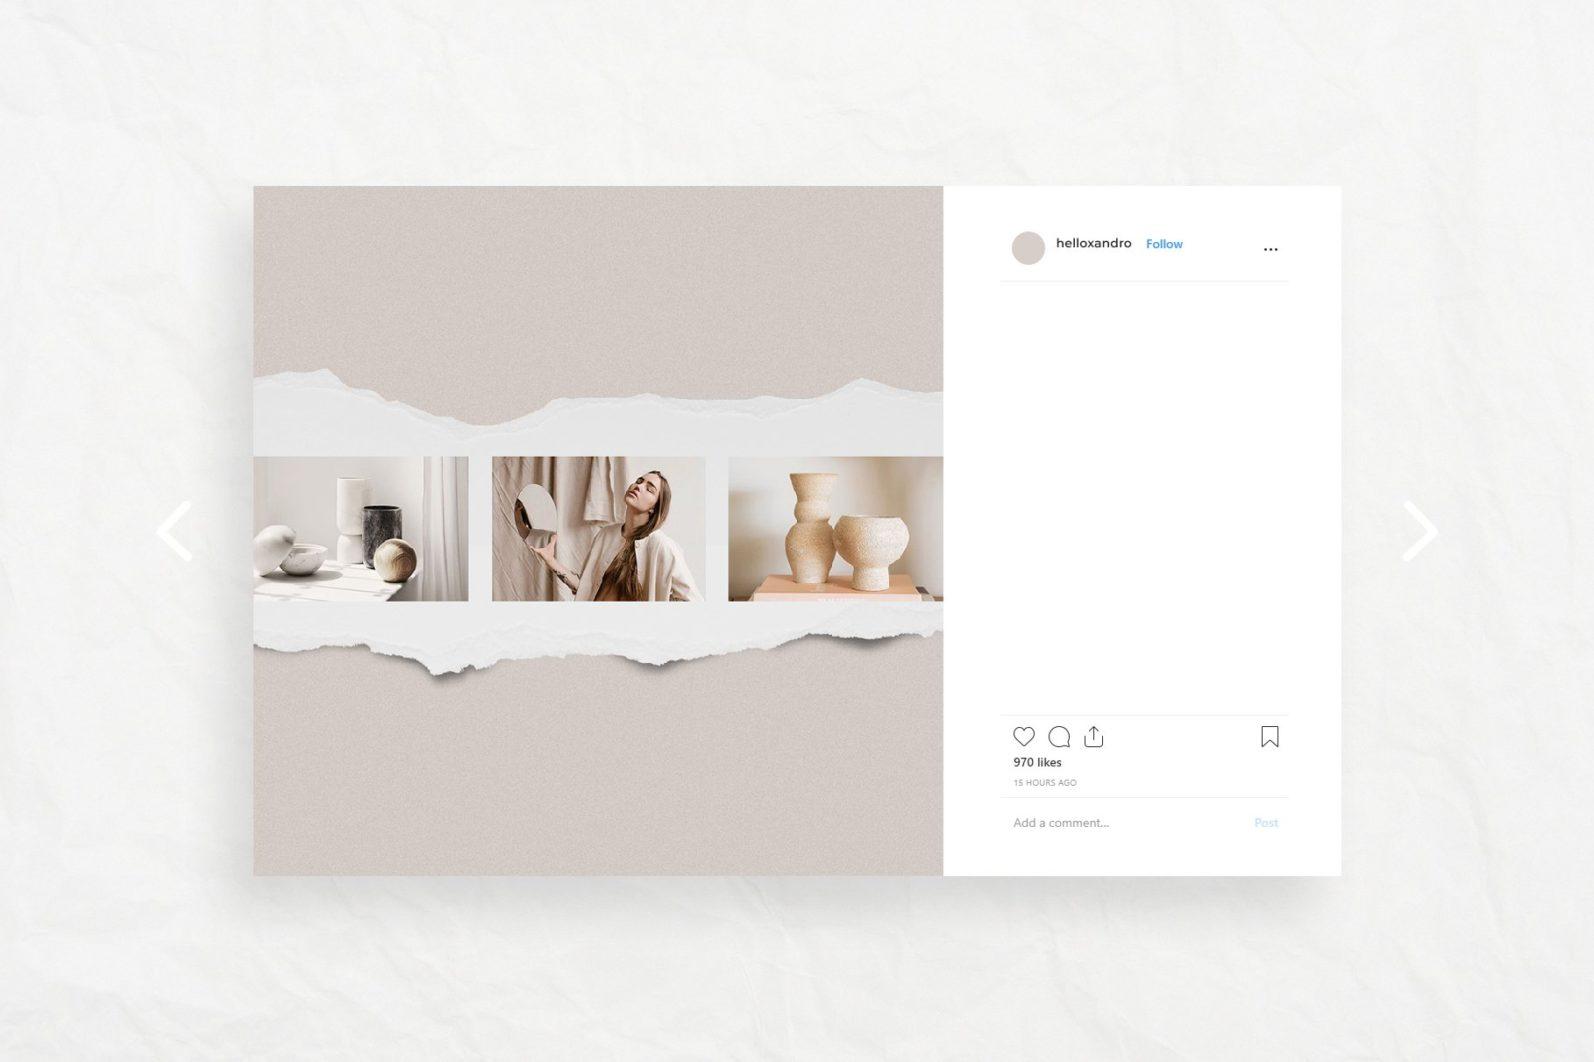 Señorita - Instagram Stories & Post - noir3 -